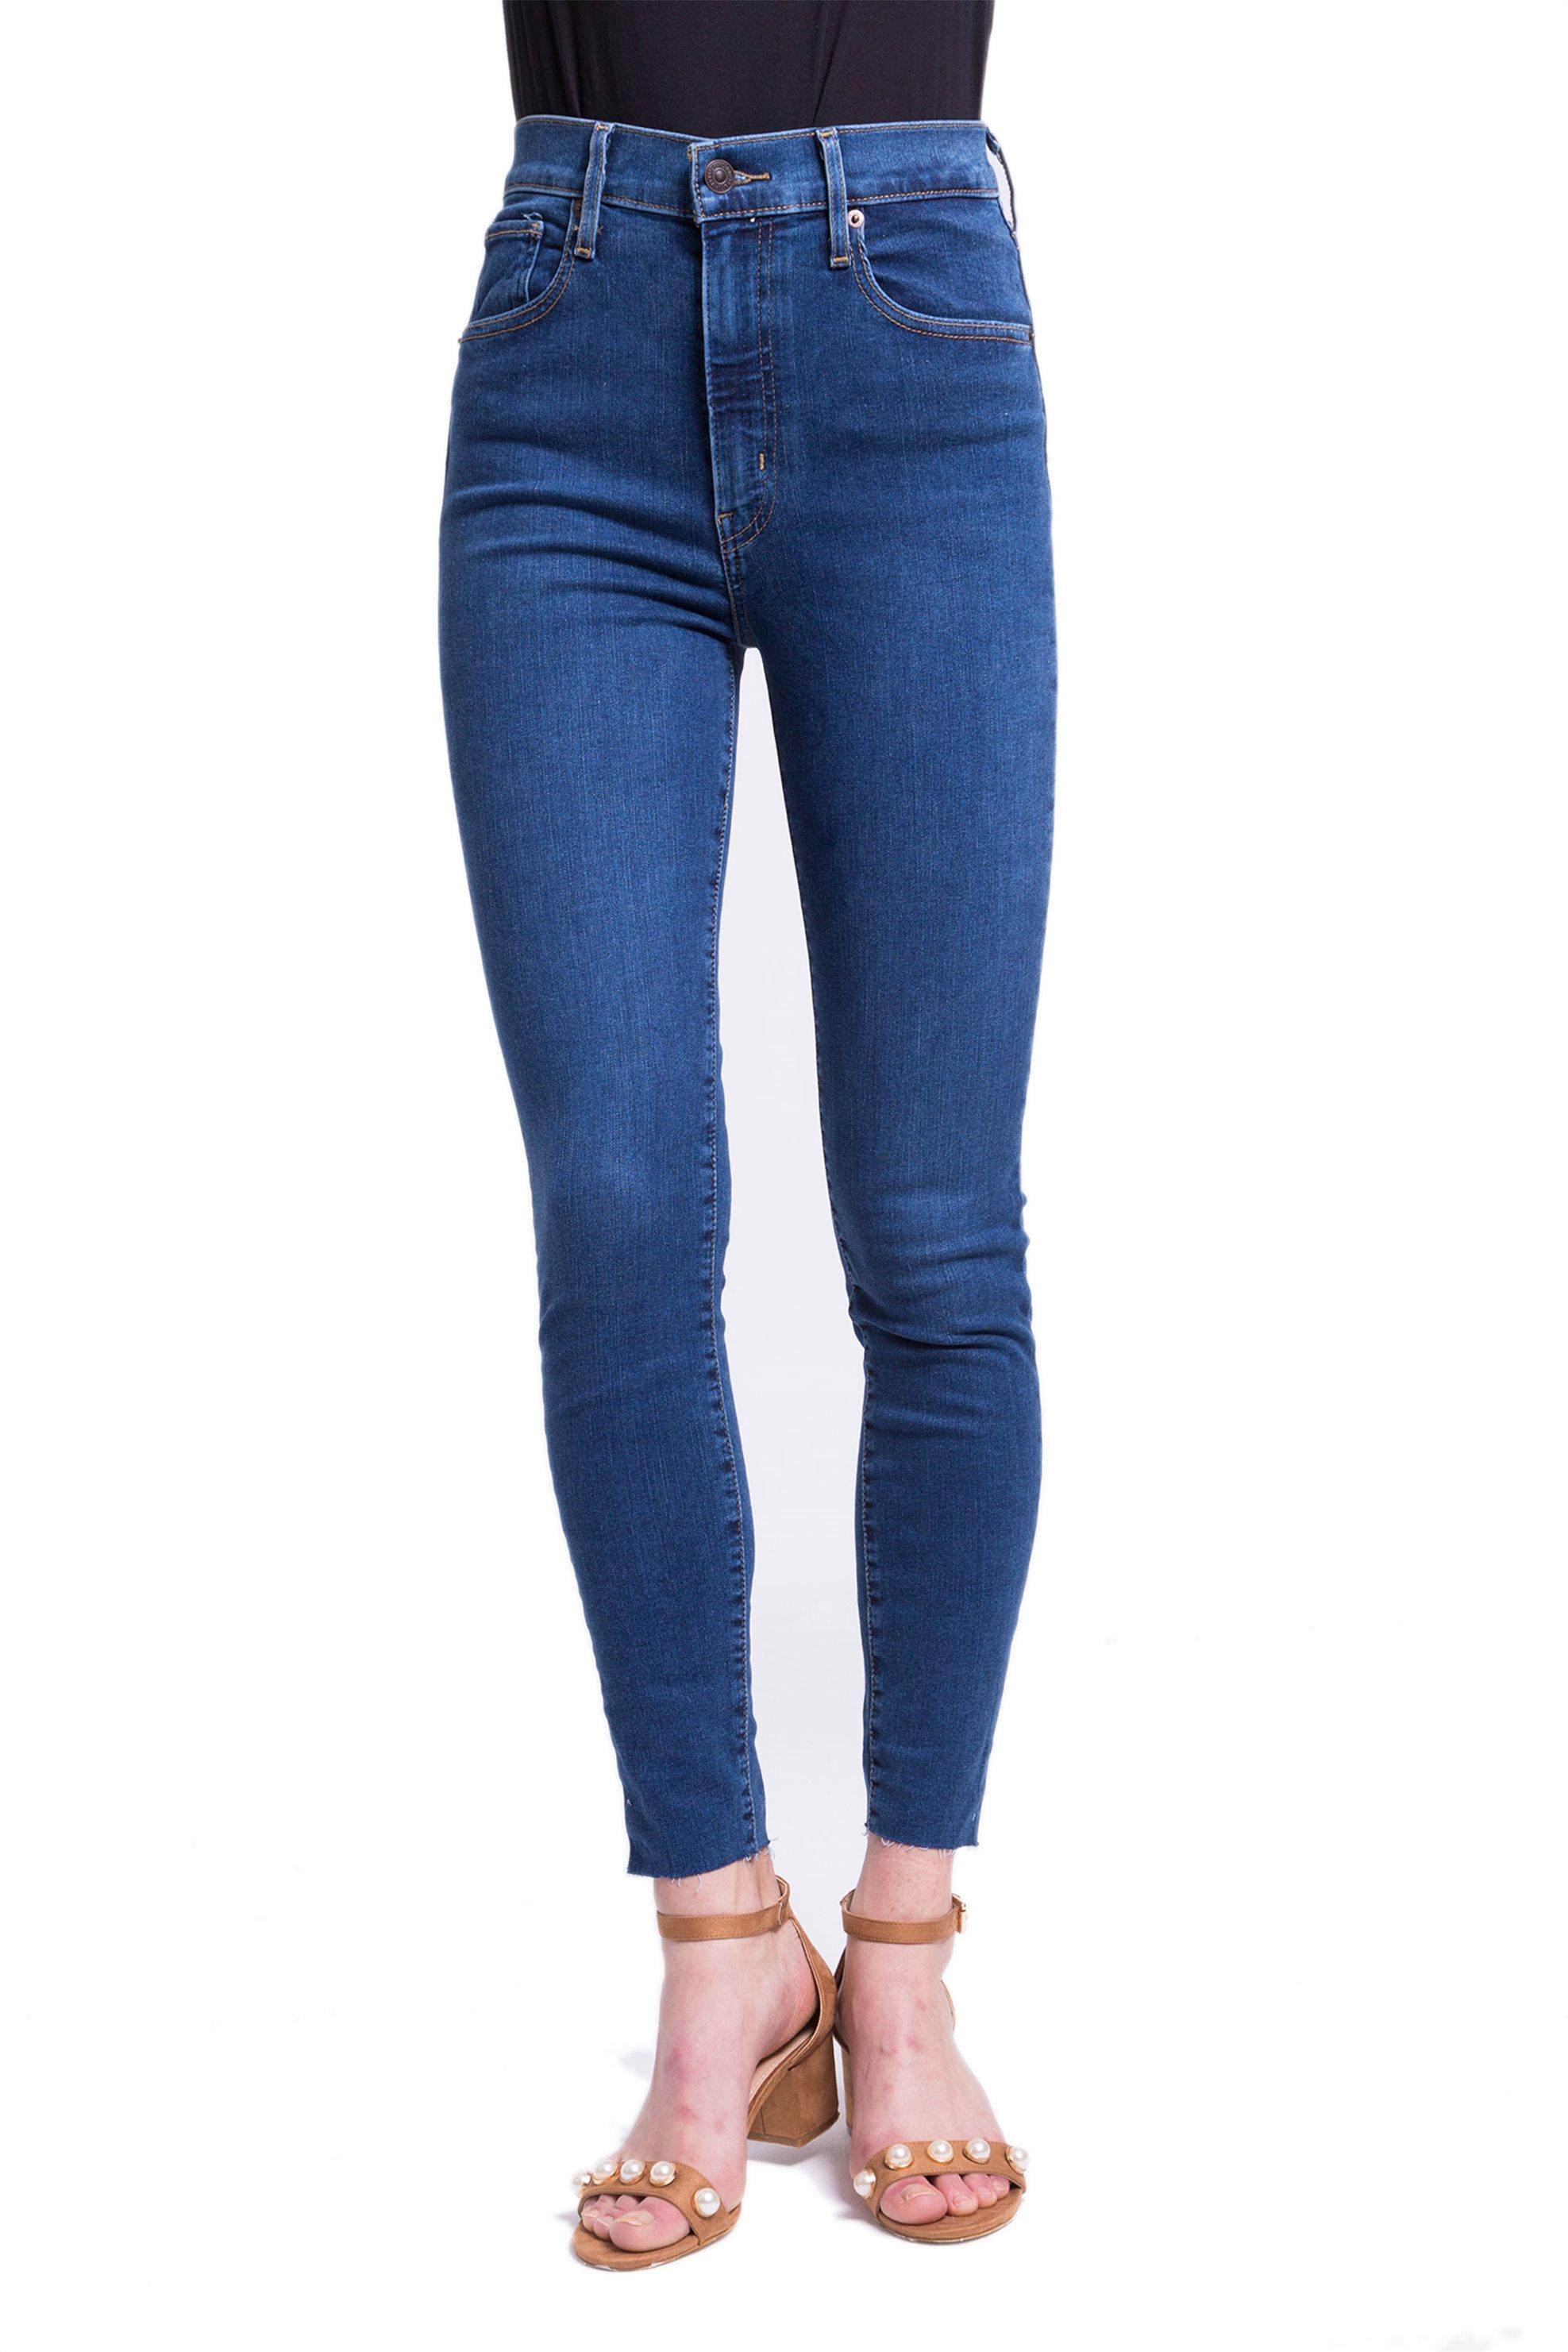 6cc84cd09a8 Γυναικεία Παντελόνια | LEVI'S | Σελίδα 4 | Snif.gr